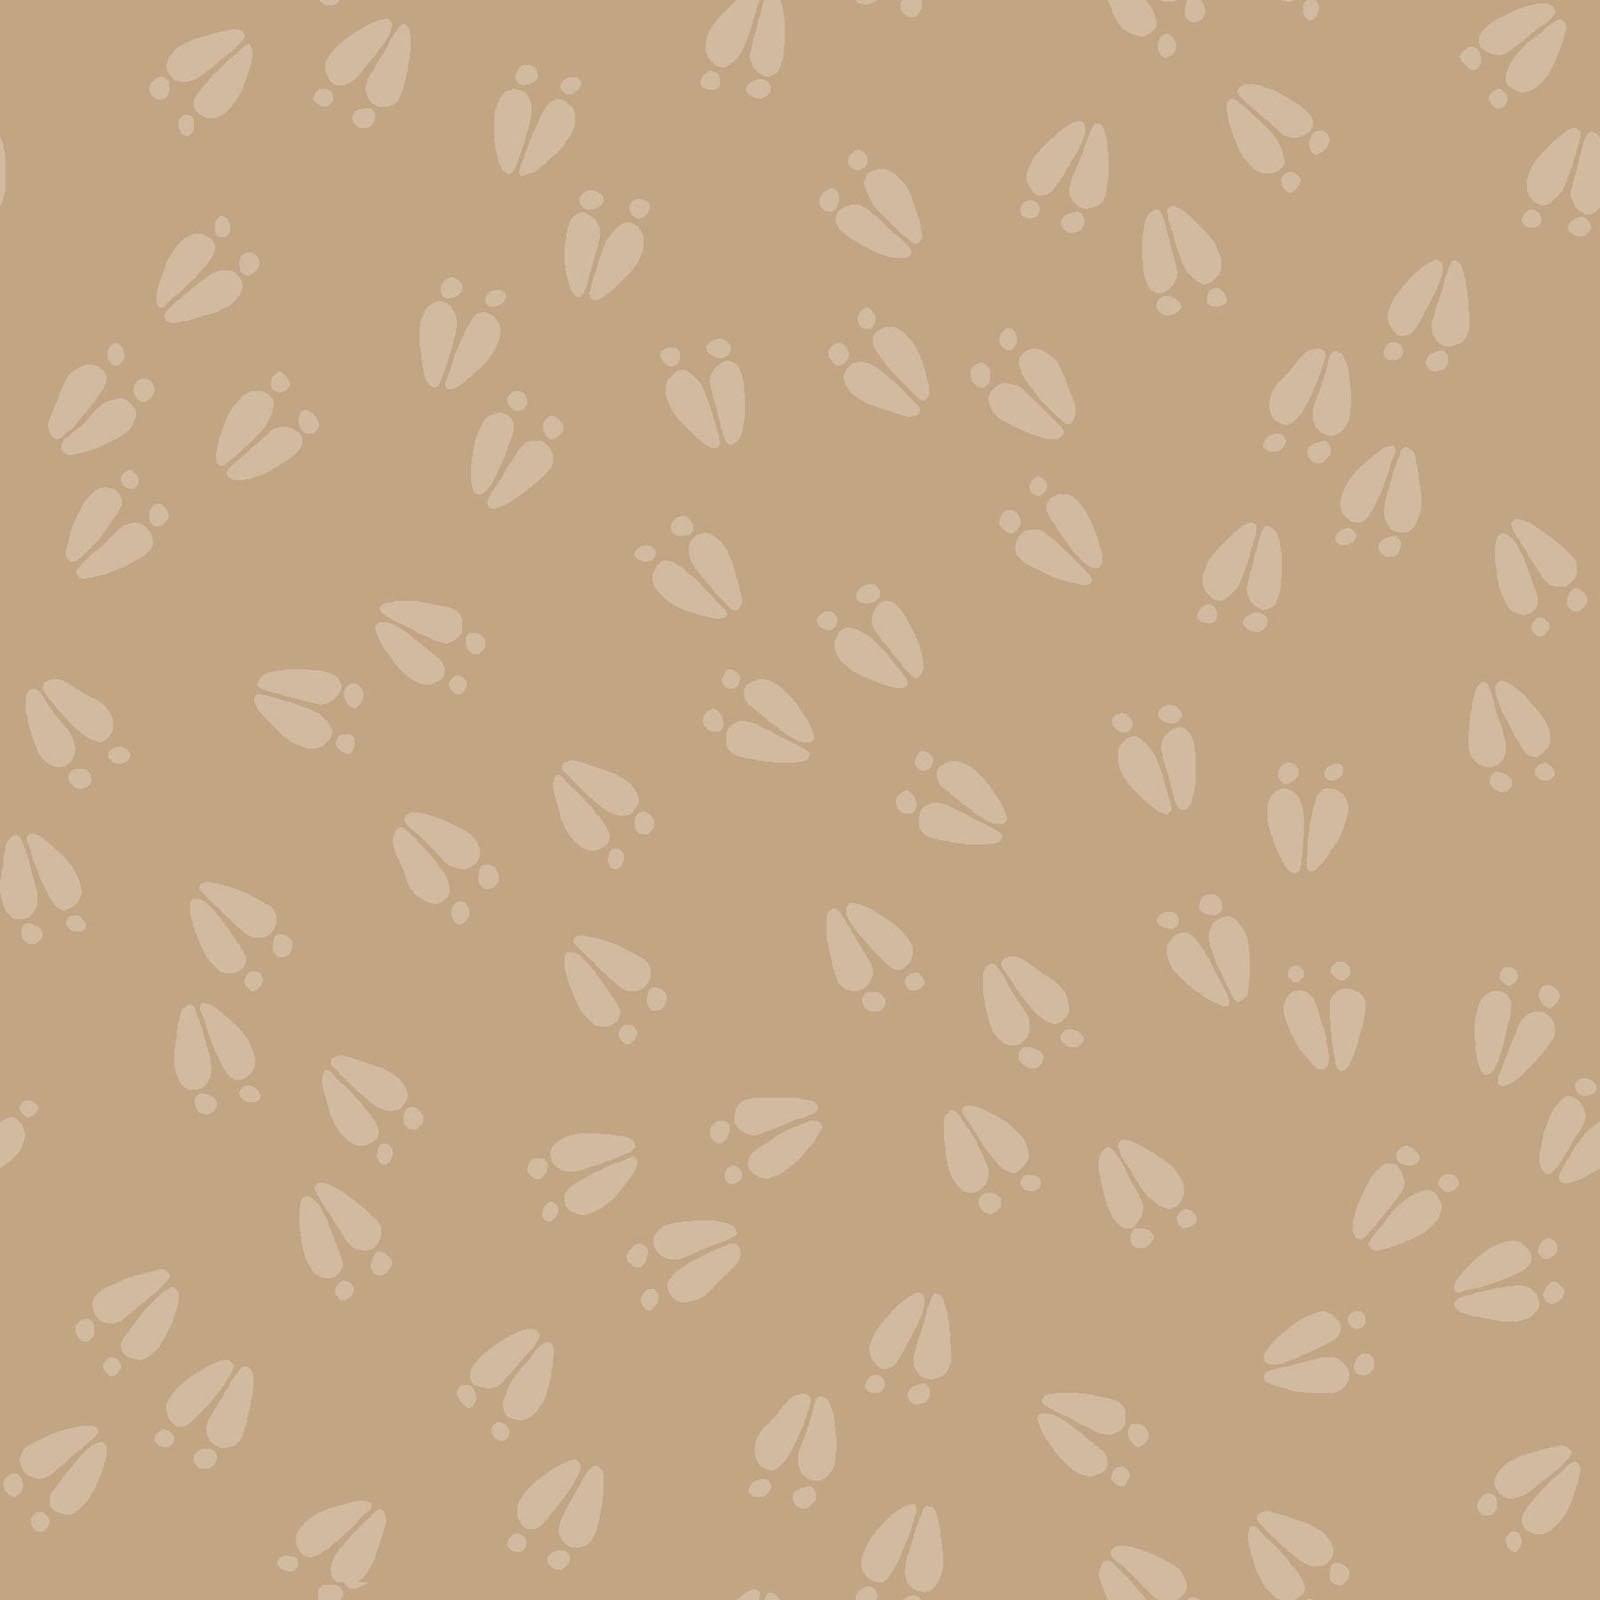 LITC-4298 NE - LITTLE CRITTERS BY ROBIN RODERICK ANIMAL PRINT CREAM